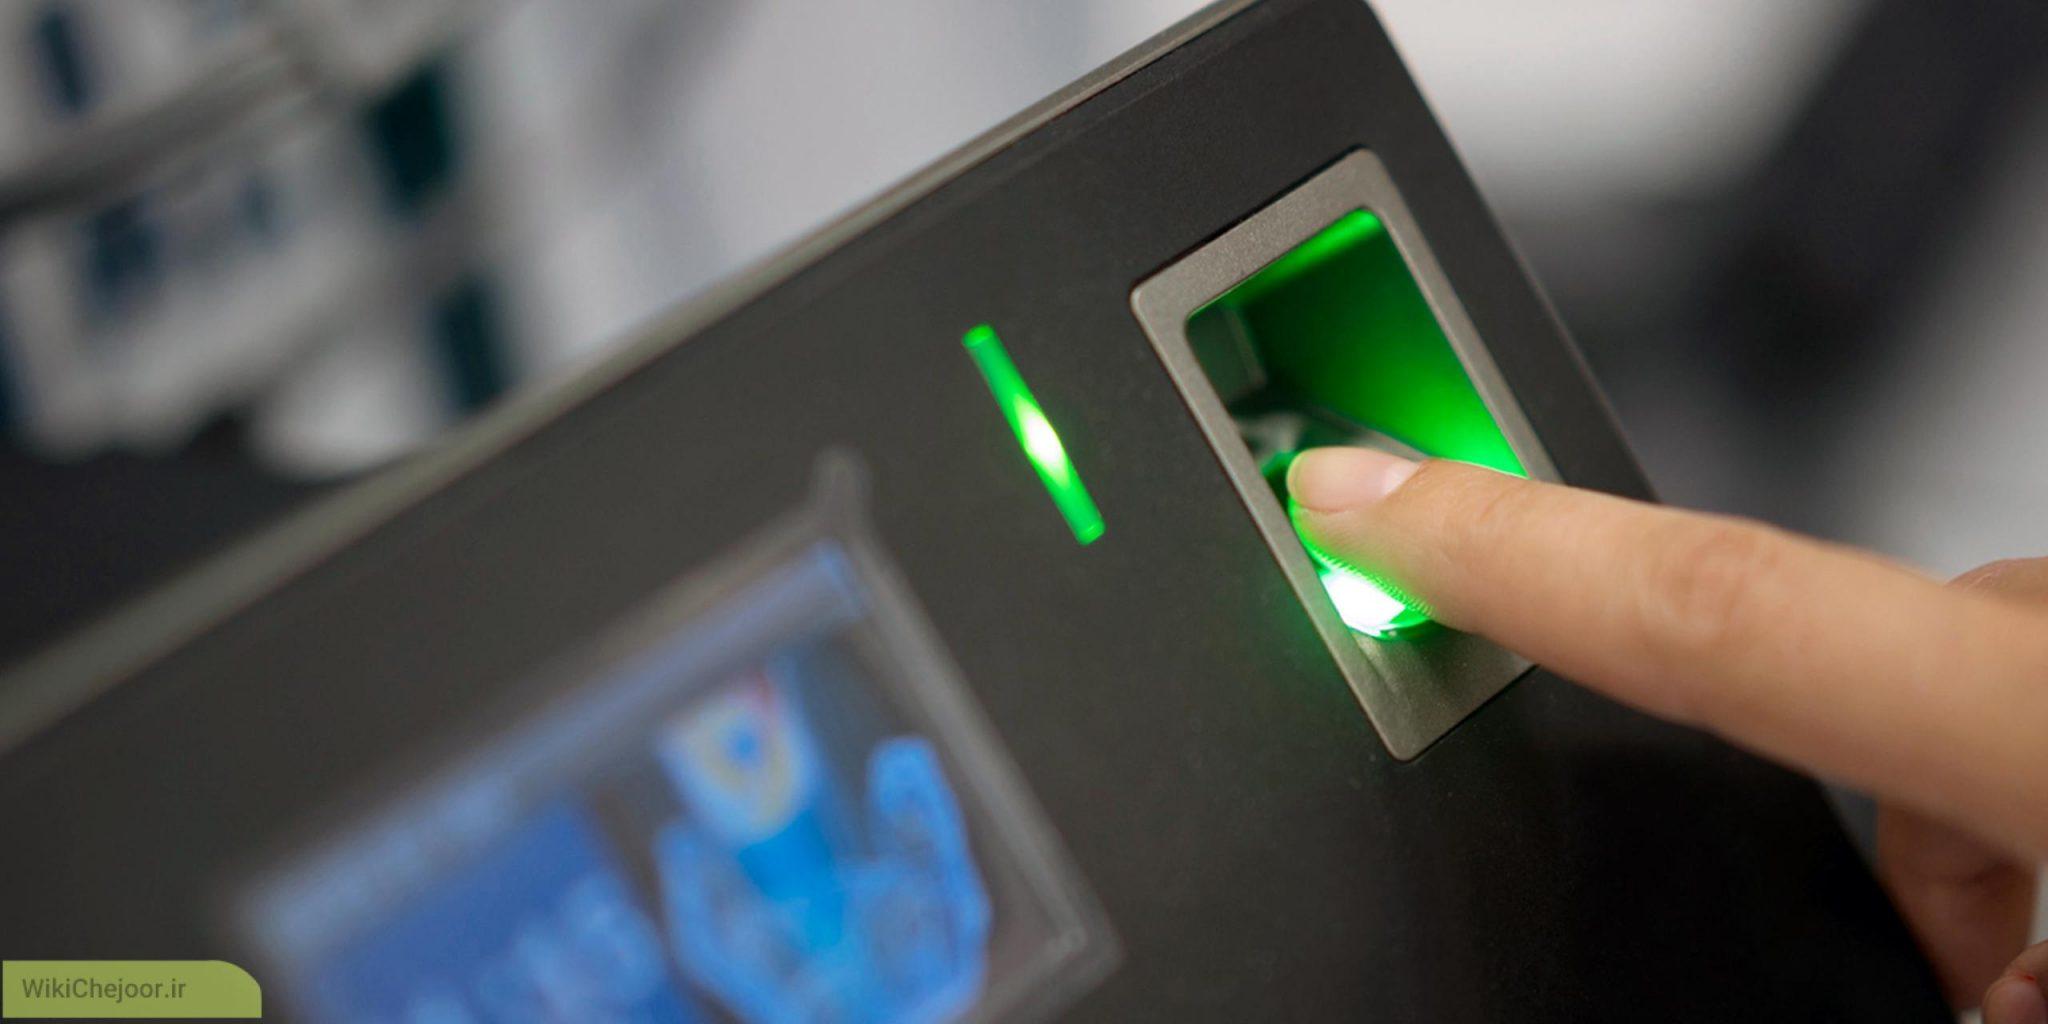 اسکنر اثر انگشت نوری ( Optical fingerprint scanner )